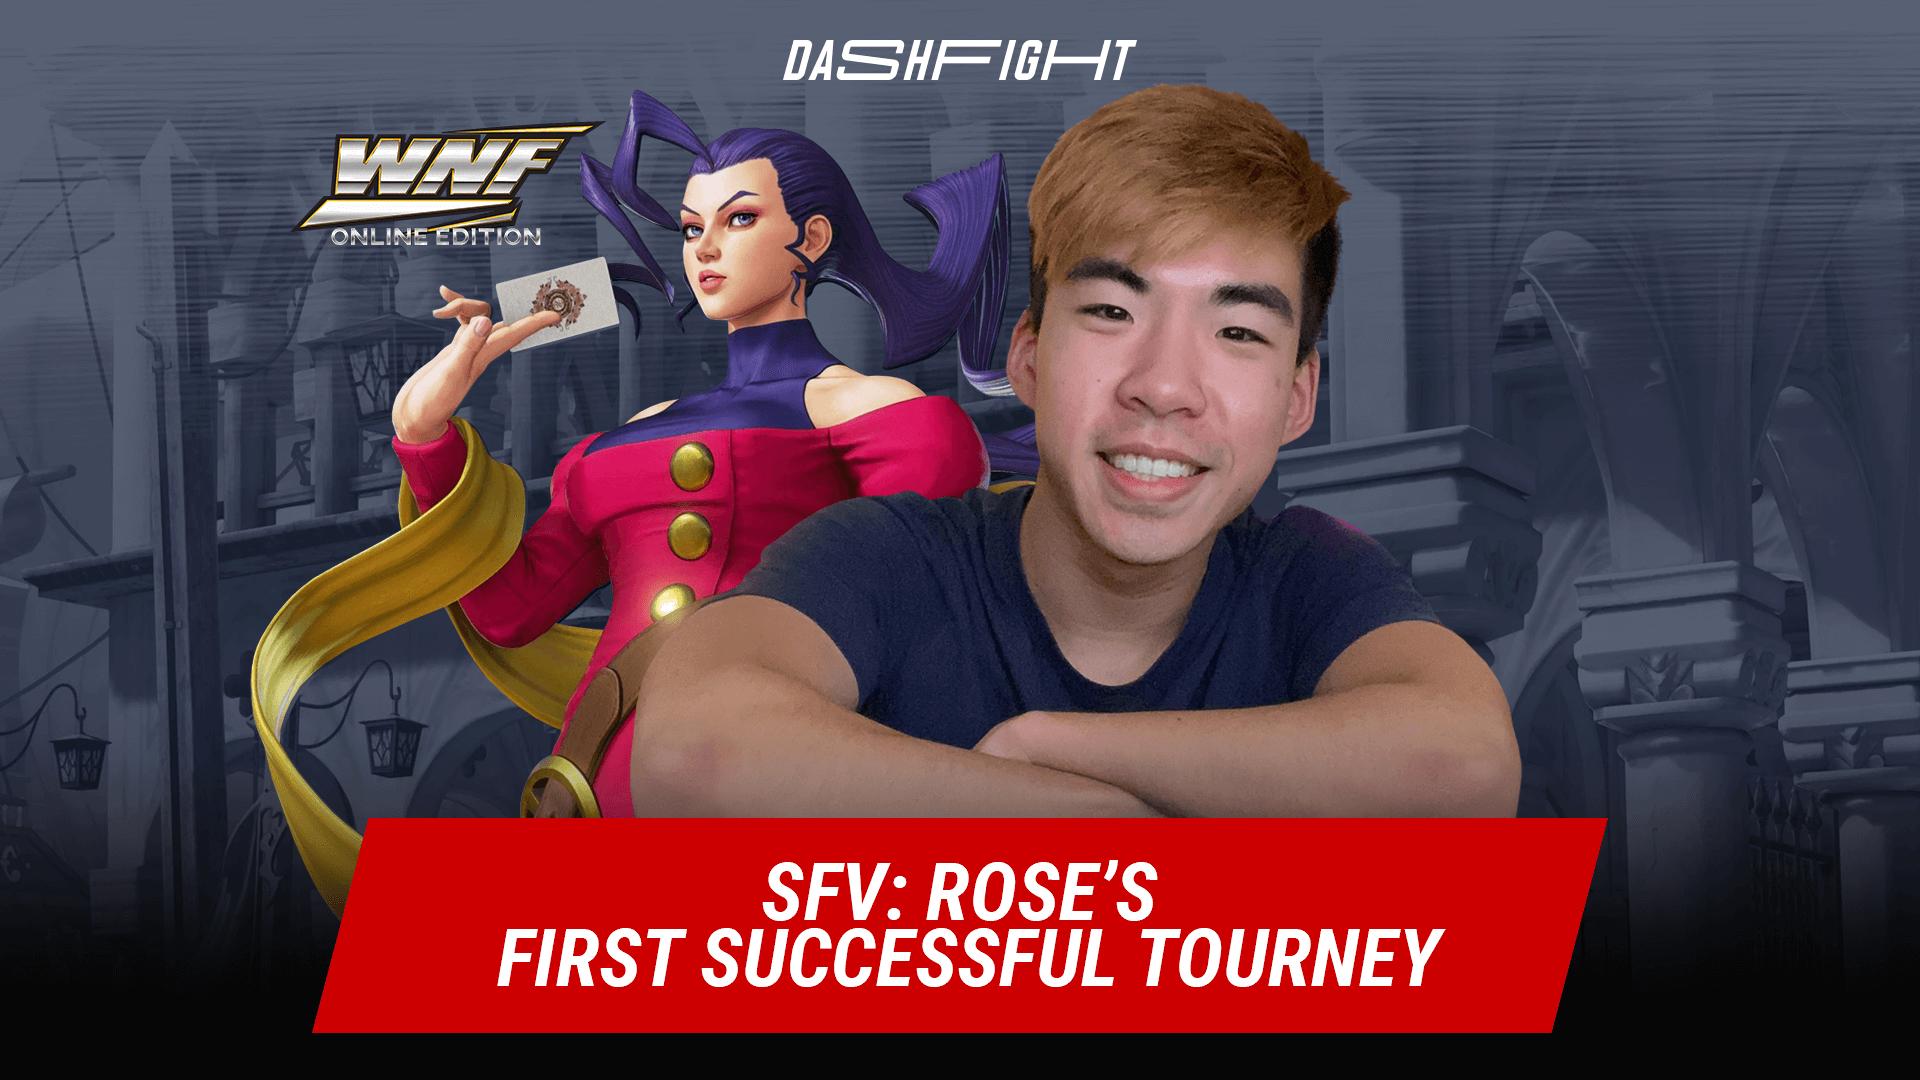 SFV: Rose's First Successful Tourney